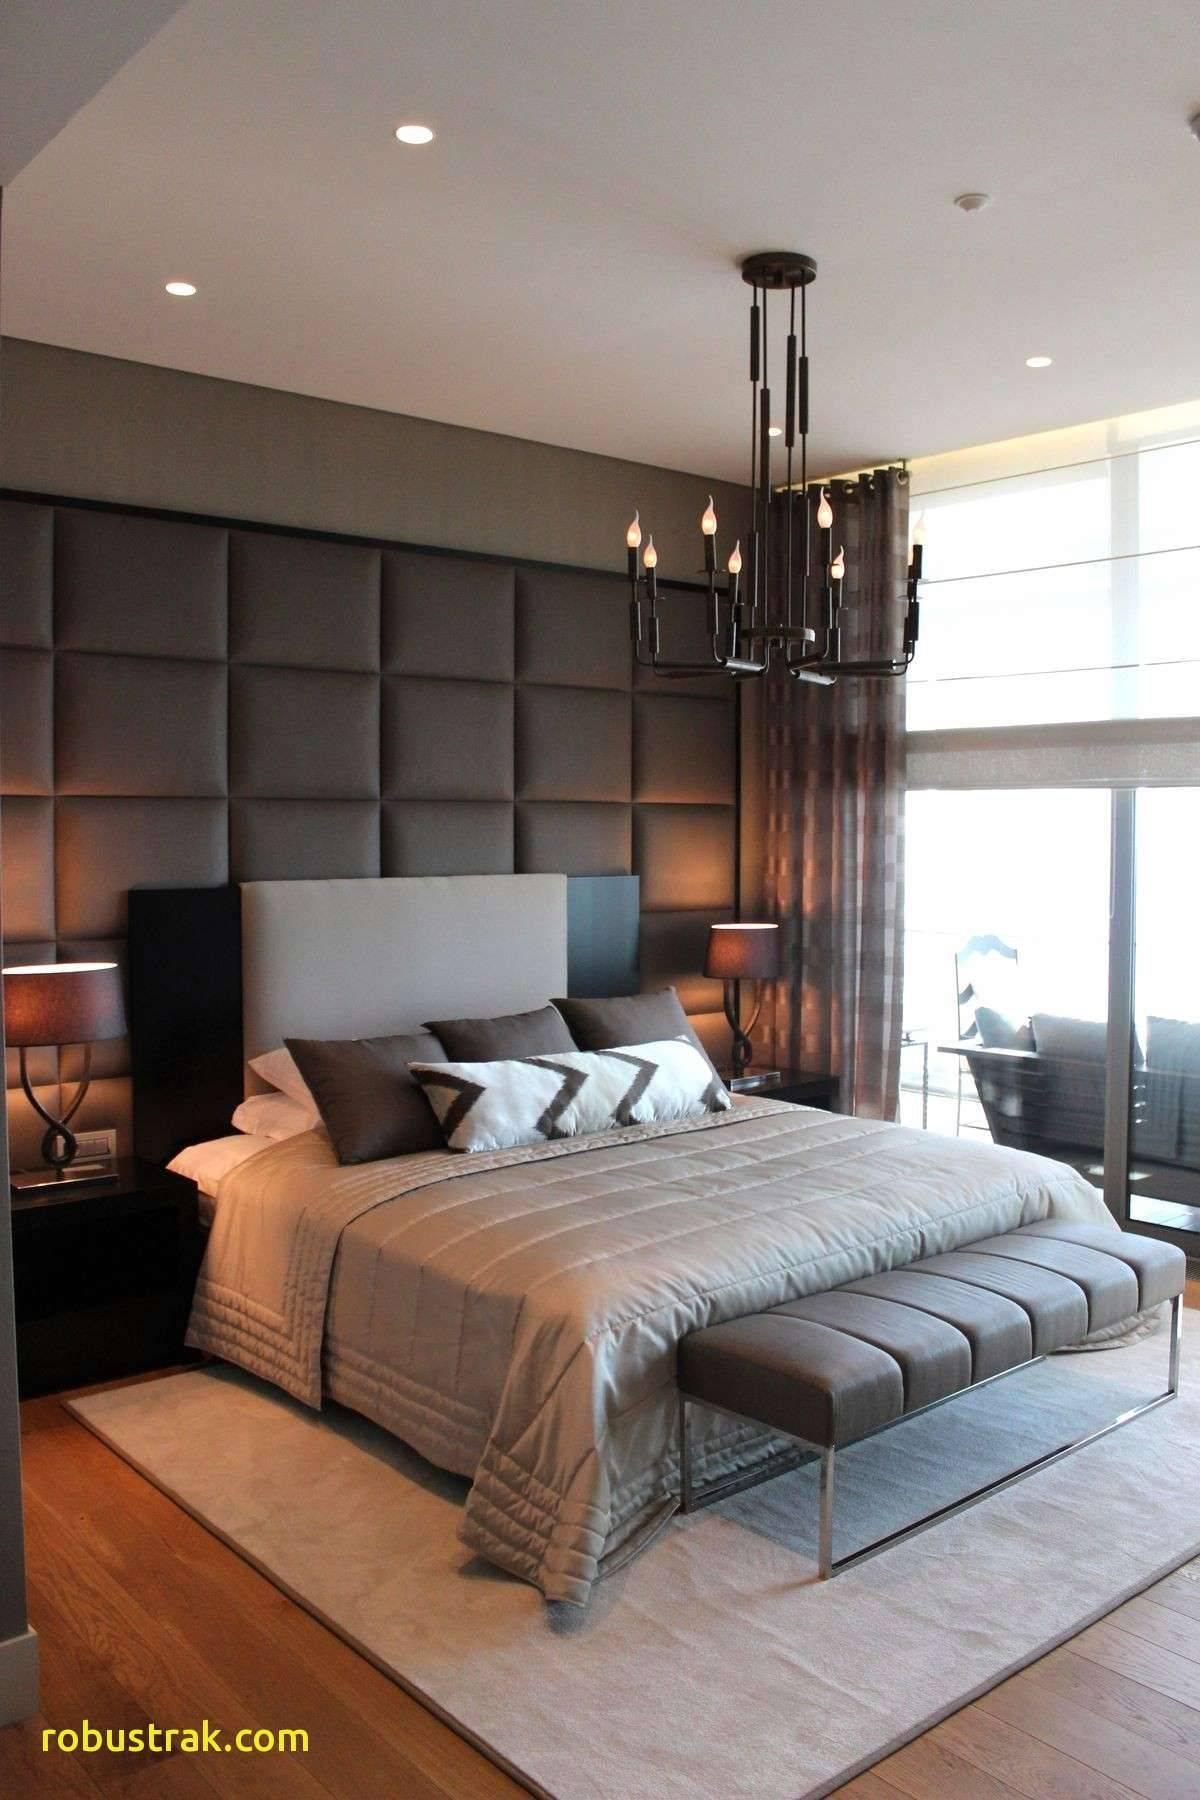 modern bedroom ideas for small rooms elegant design bedroom wall lovely media cache ec0 pinimg 1200x 03 01 0d of modern bedroom ideas for small rooms